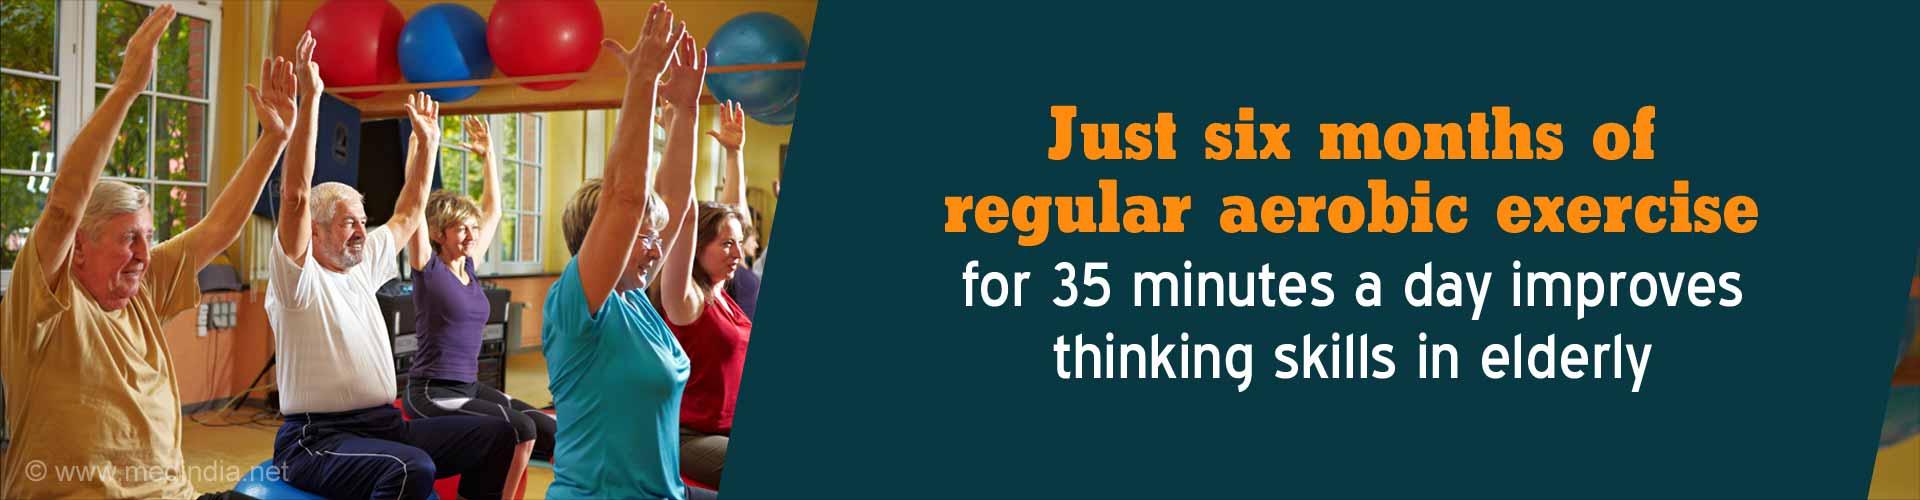 Exercise Helps Improve Brain Function in Elderly